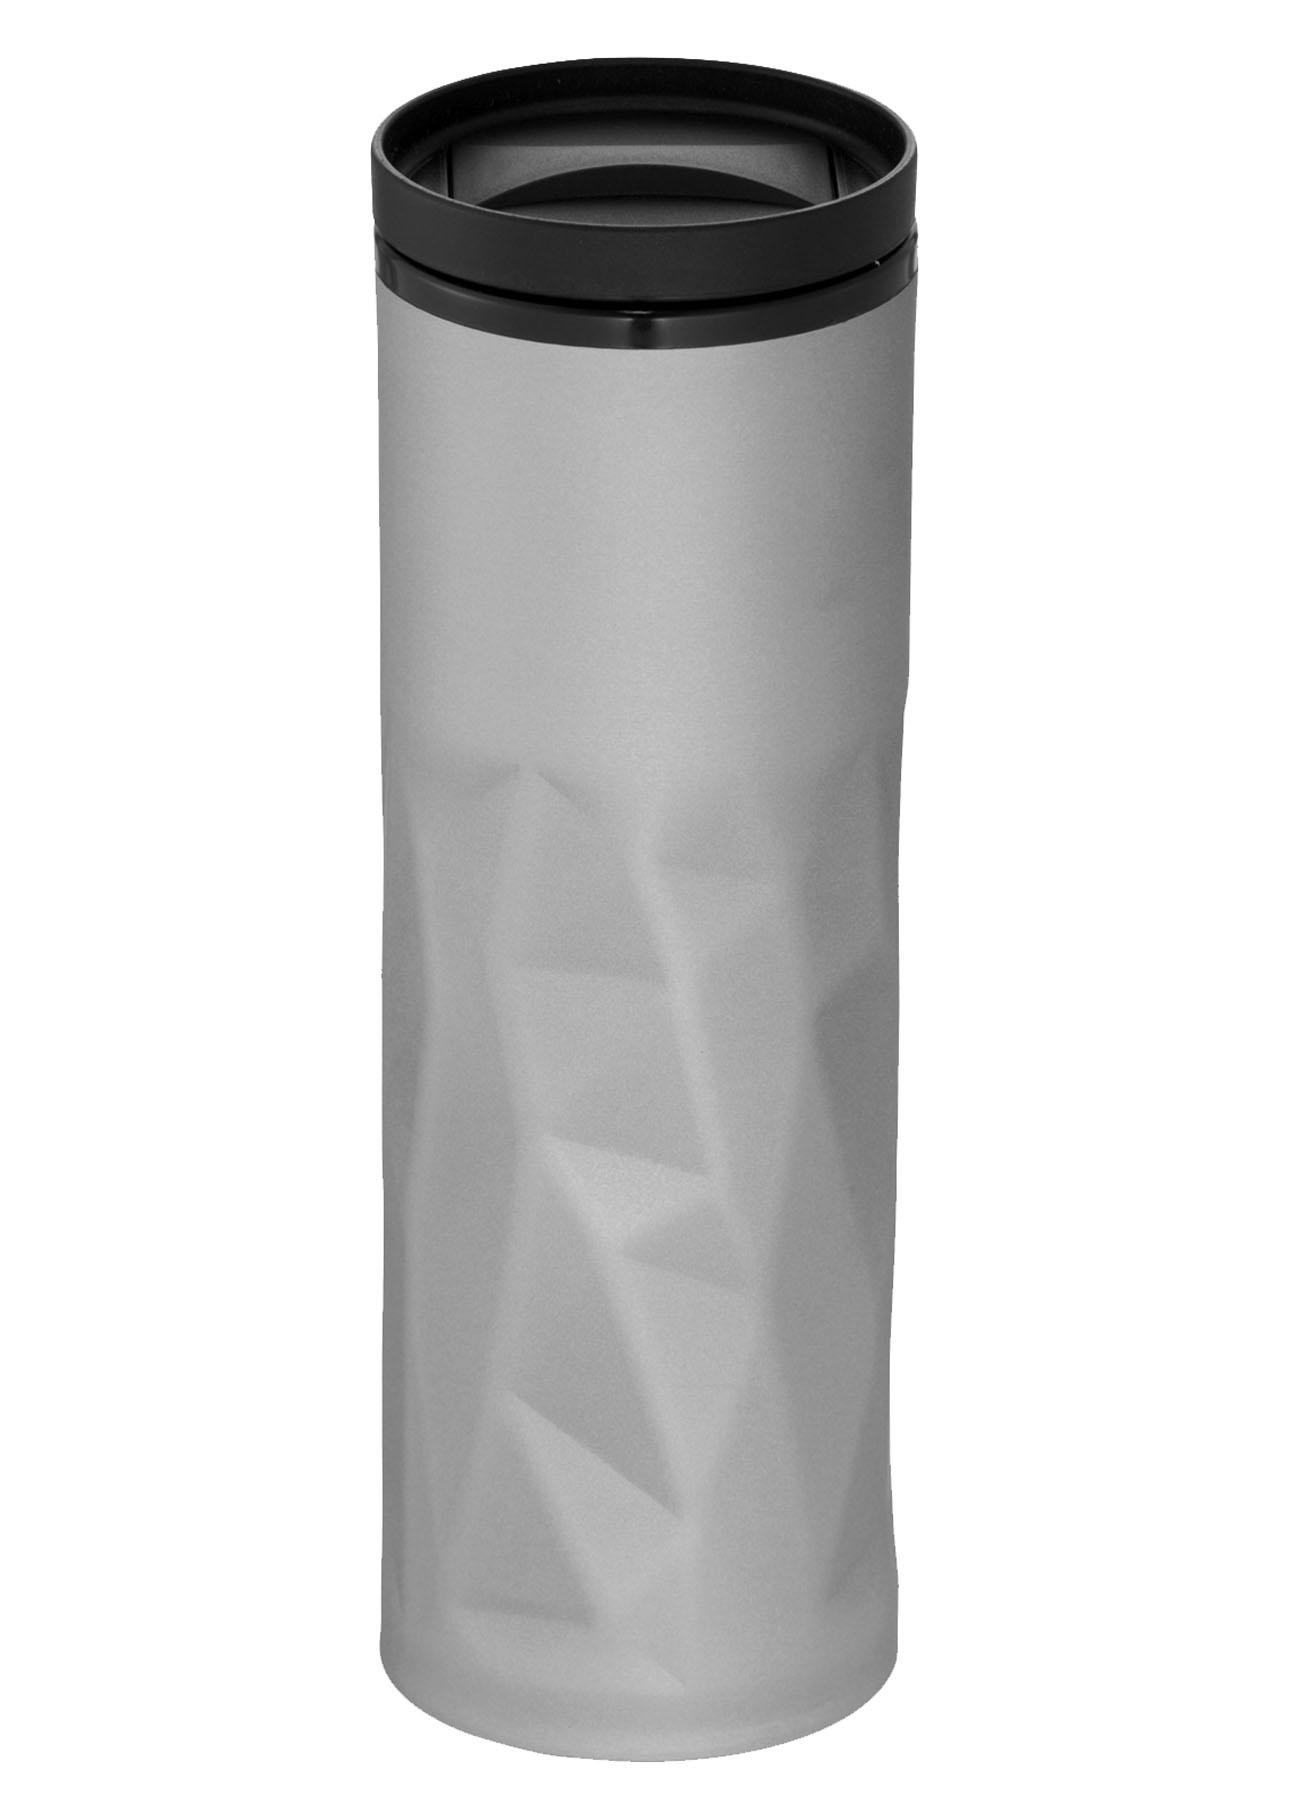 EDELSTAHLBECHER Ø 8 cm 0,3 Liter EDELSTAHL TRINK BECHER KAFFEEBECHER TASSE